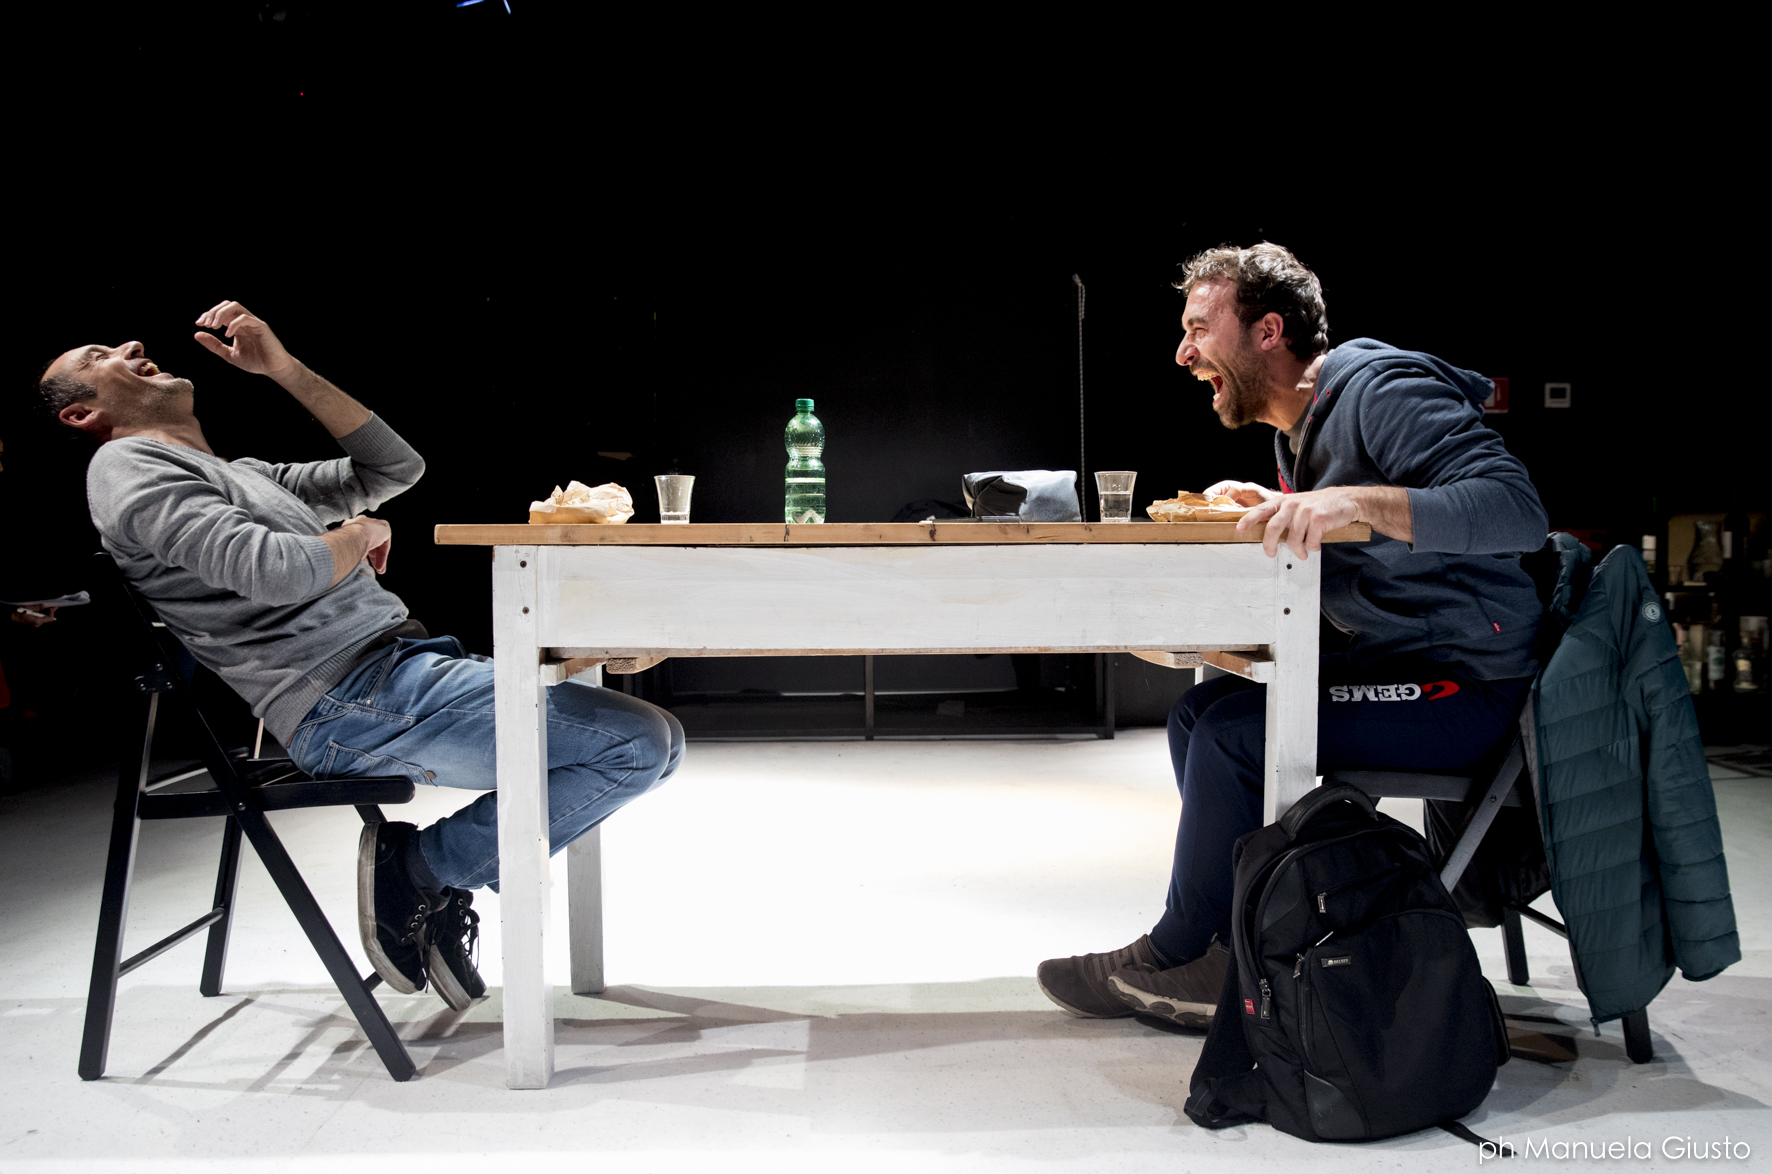 Per Caterina – In scena a Teatro Argot Studio